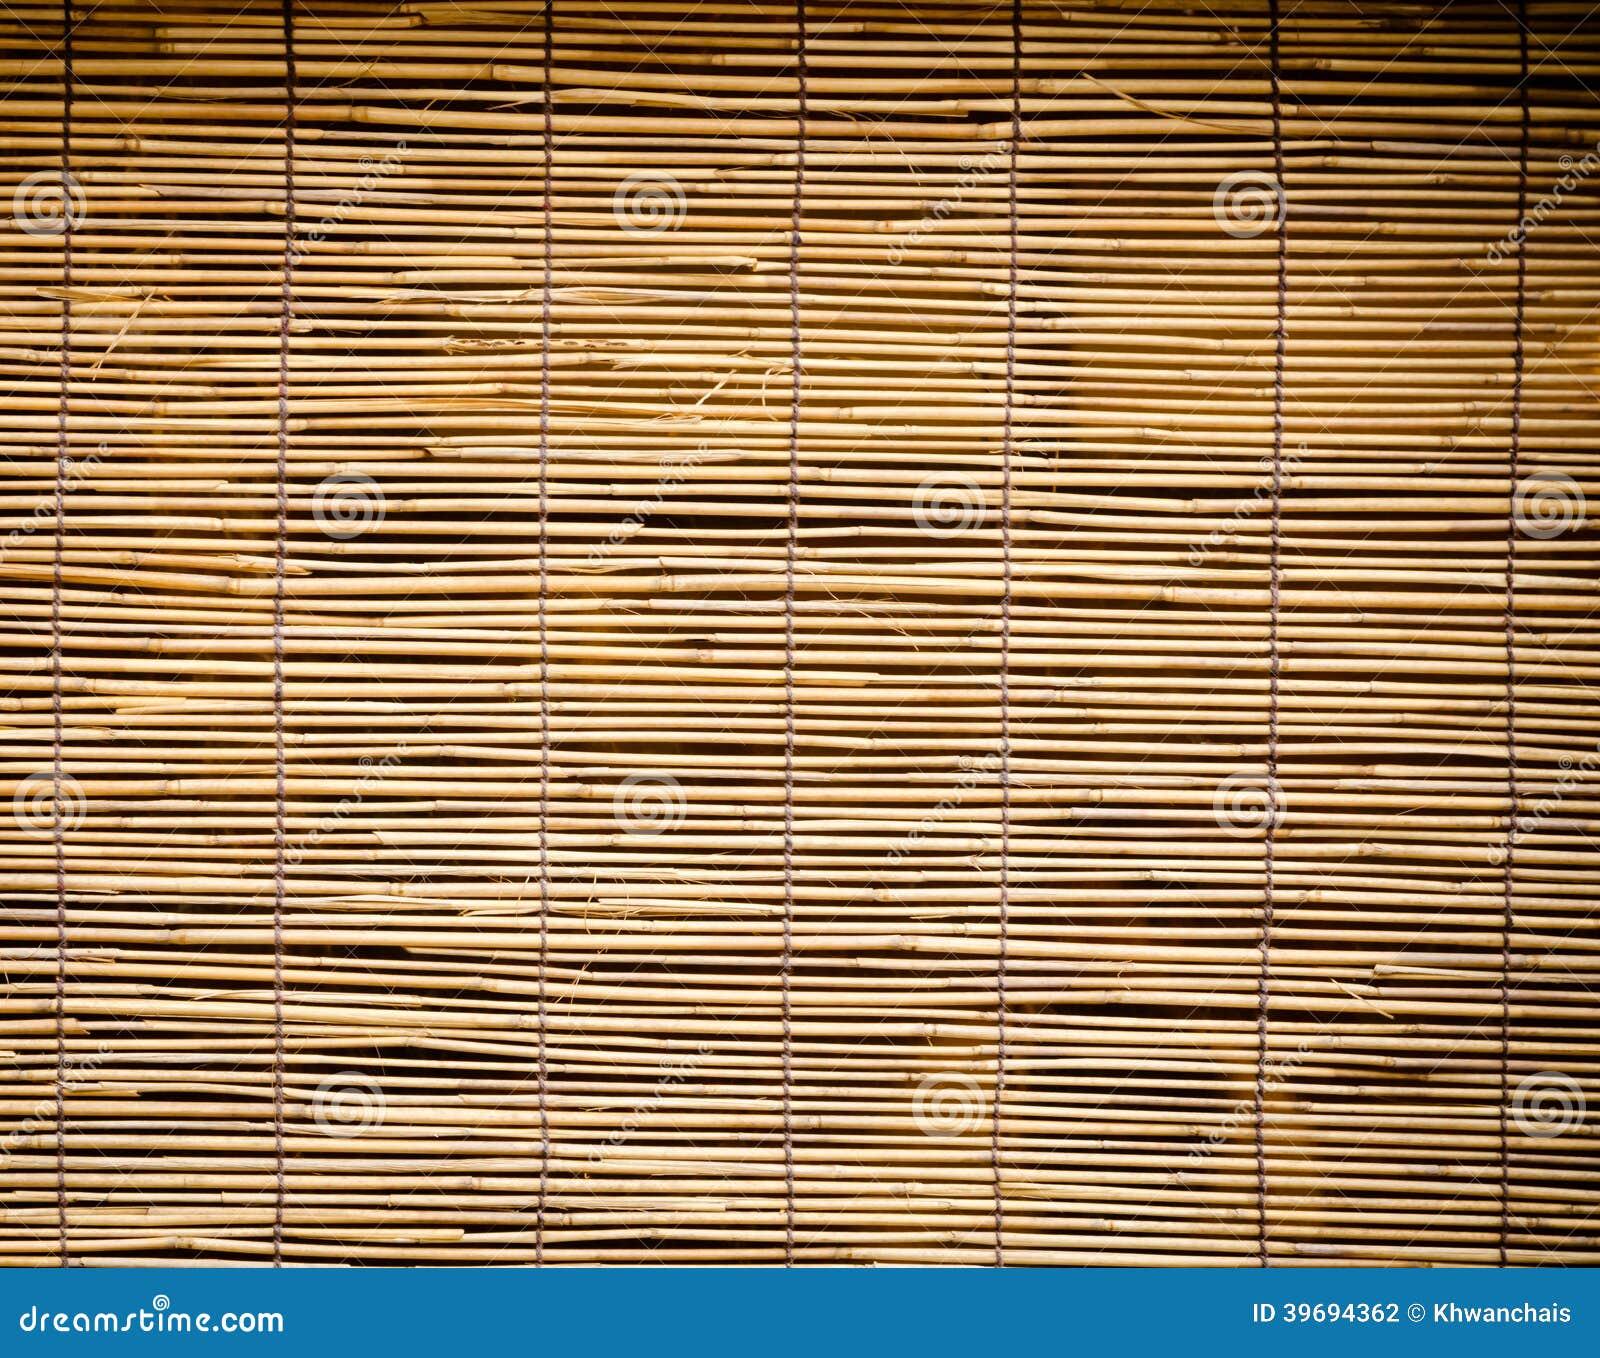 rideau en bambou photo stock image du lumi re bambou 39694362. Black Bedroom Furniture Sets. Home Design Ideas